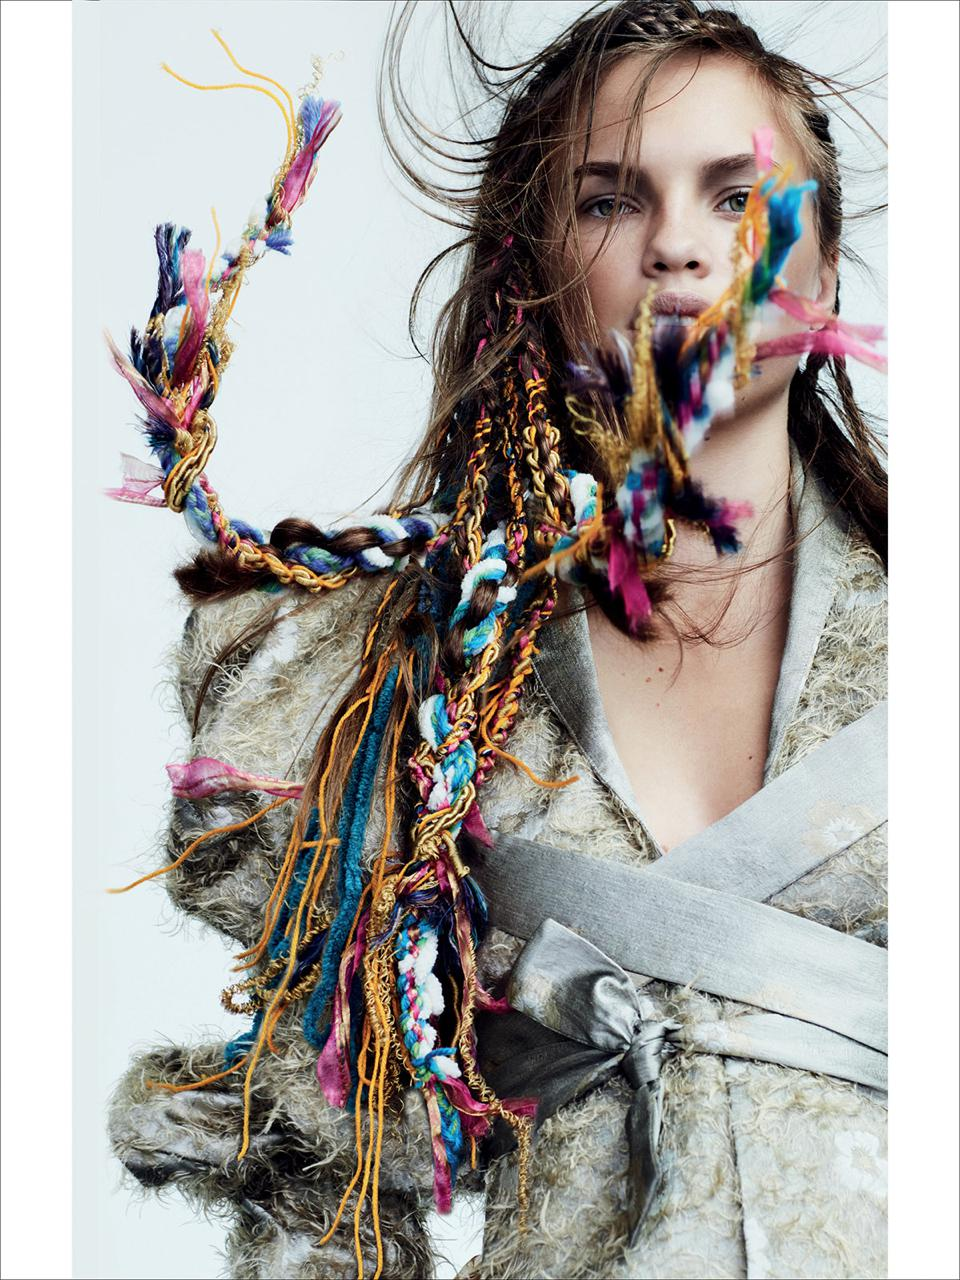 Włosy: Darren Ambrose @ D&J Ambrose/Zdjęcia: Jenny Hands/Makijaż: Mary Jane Frost/Stylizacja: Jackie Ambrose